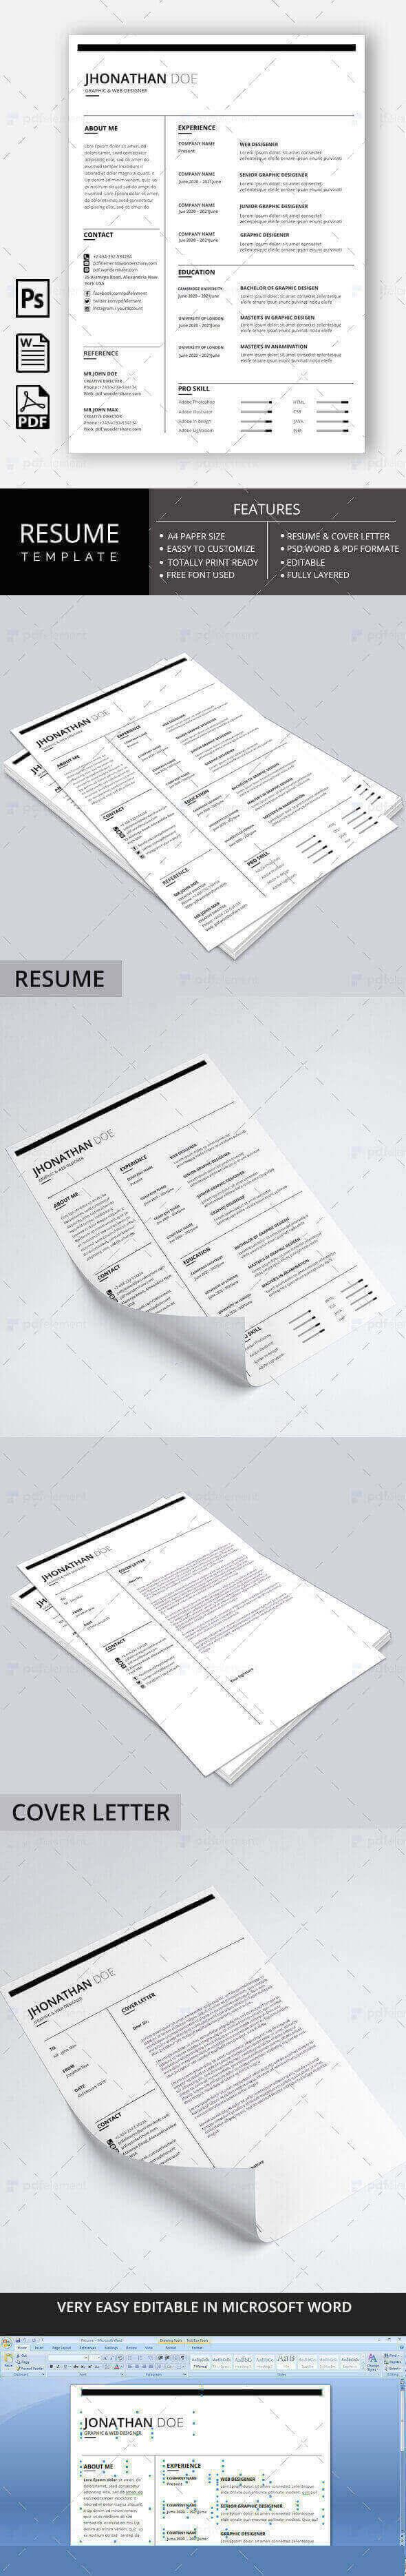 Resume Template - Modern Line